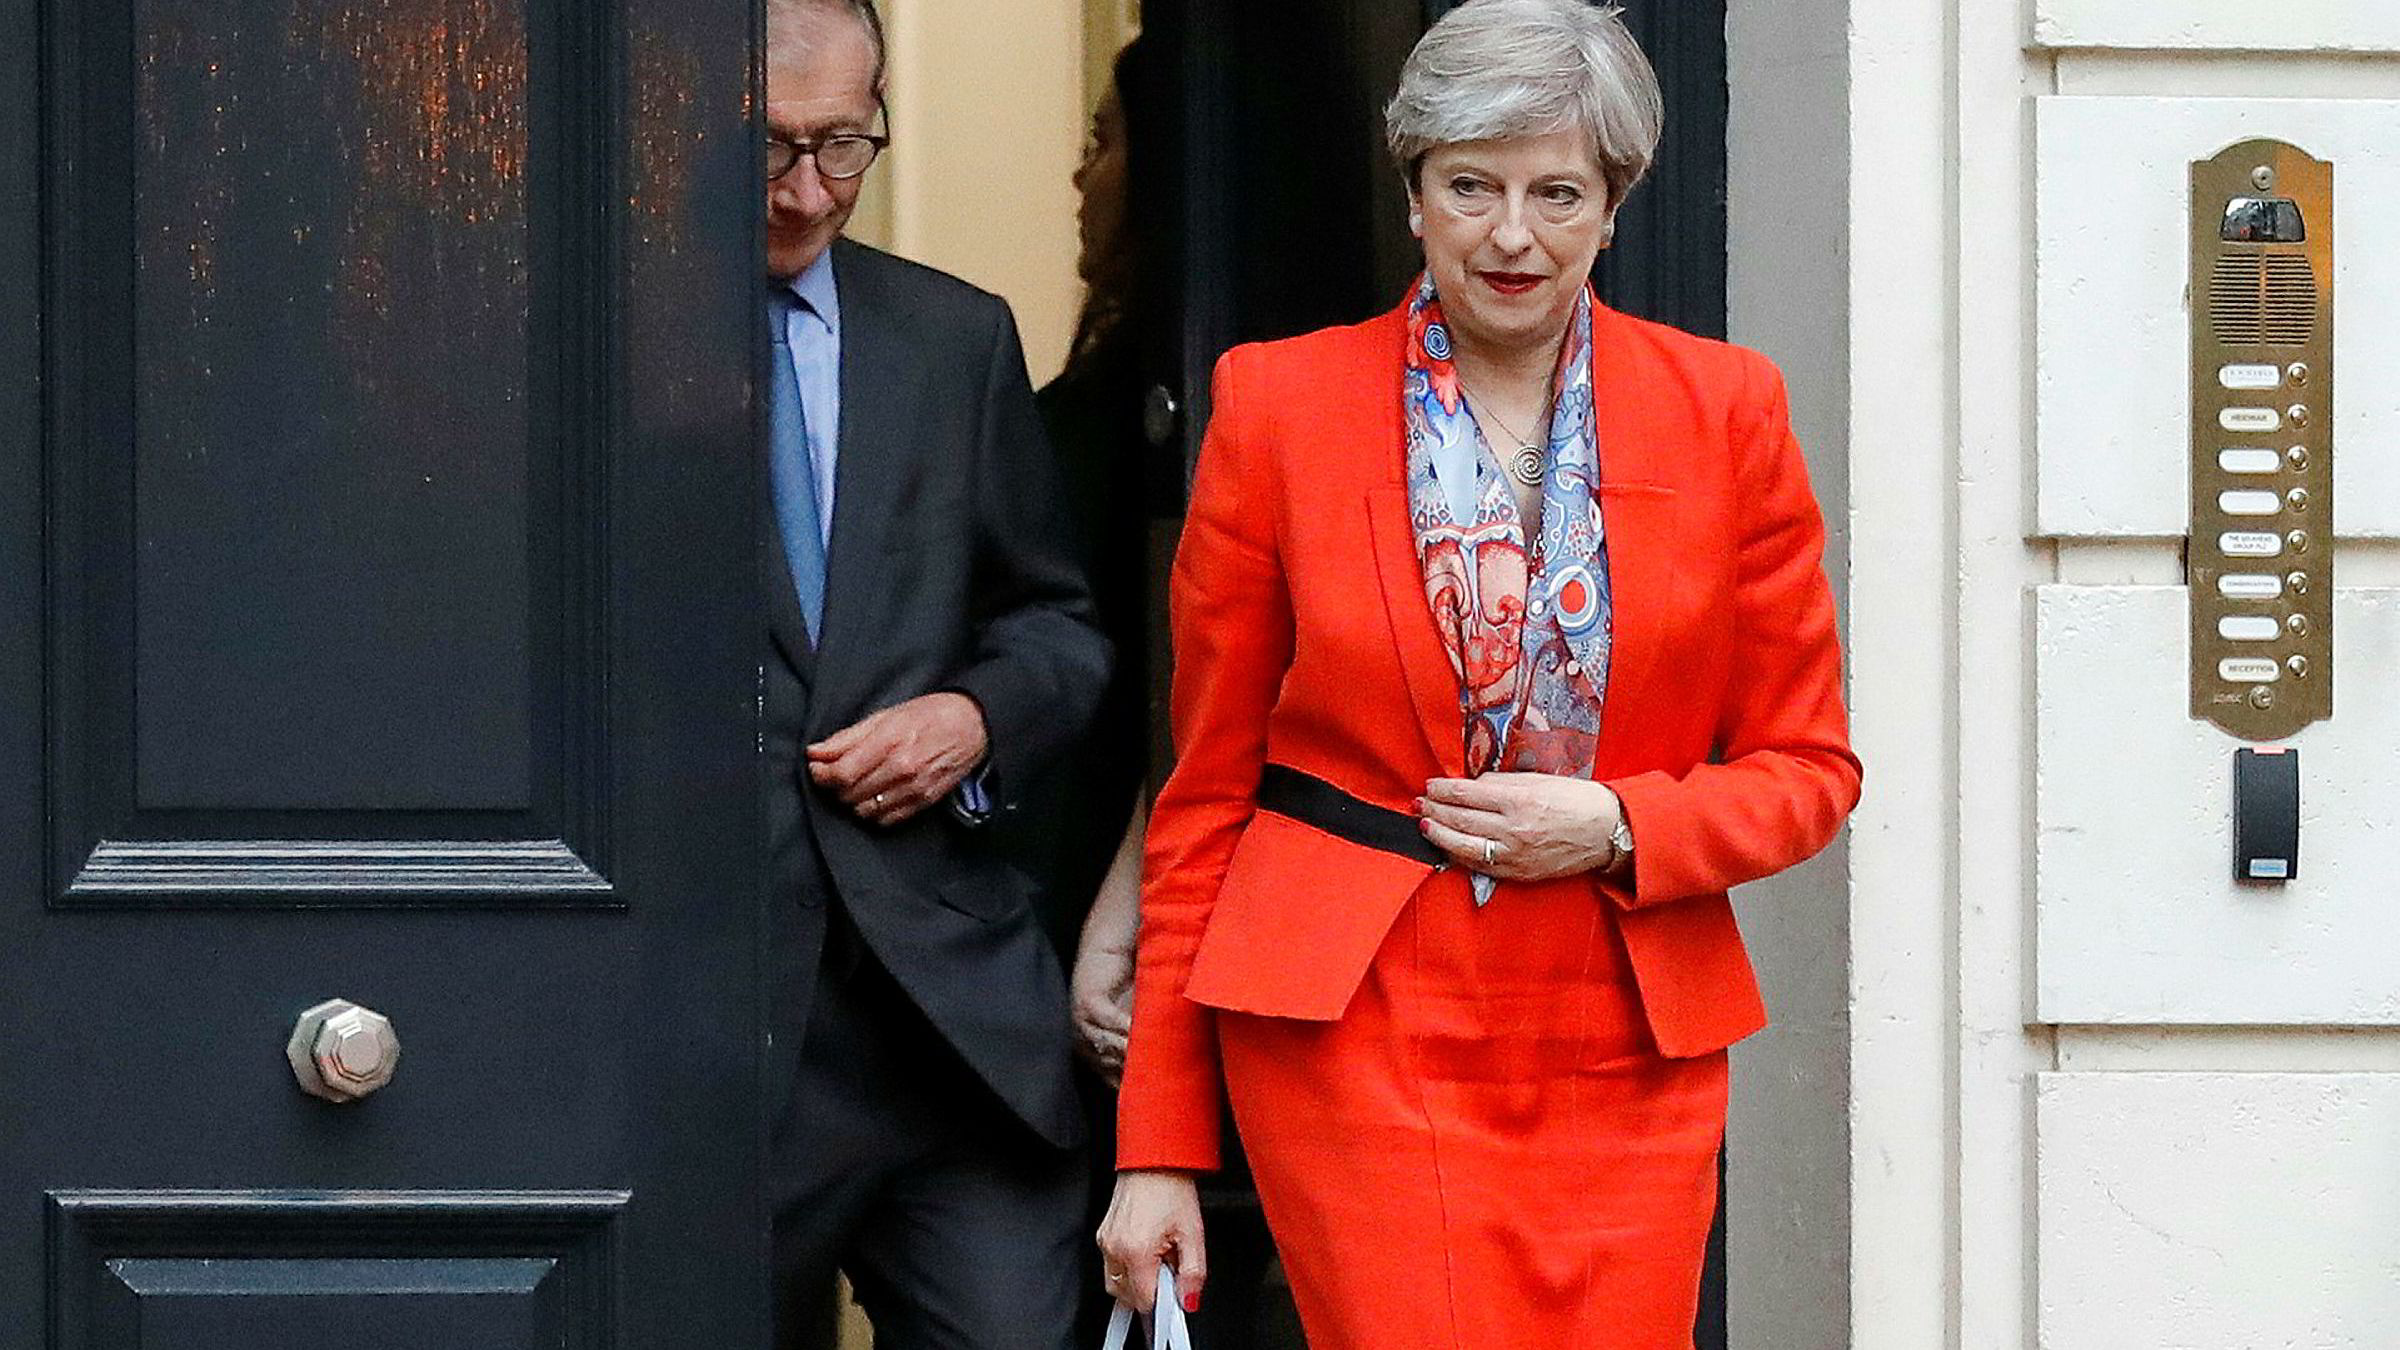 Statsminister Theresa May er hardt presset etter et dårlig valg for De konservative.